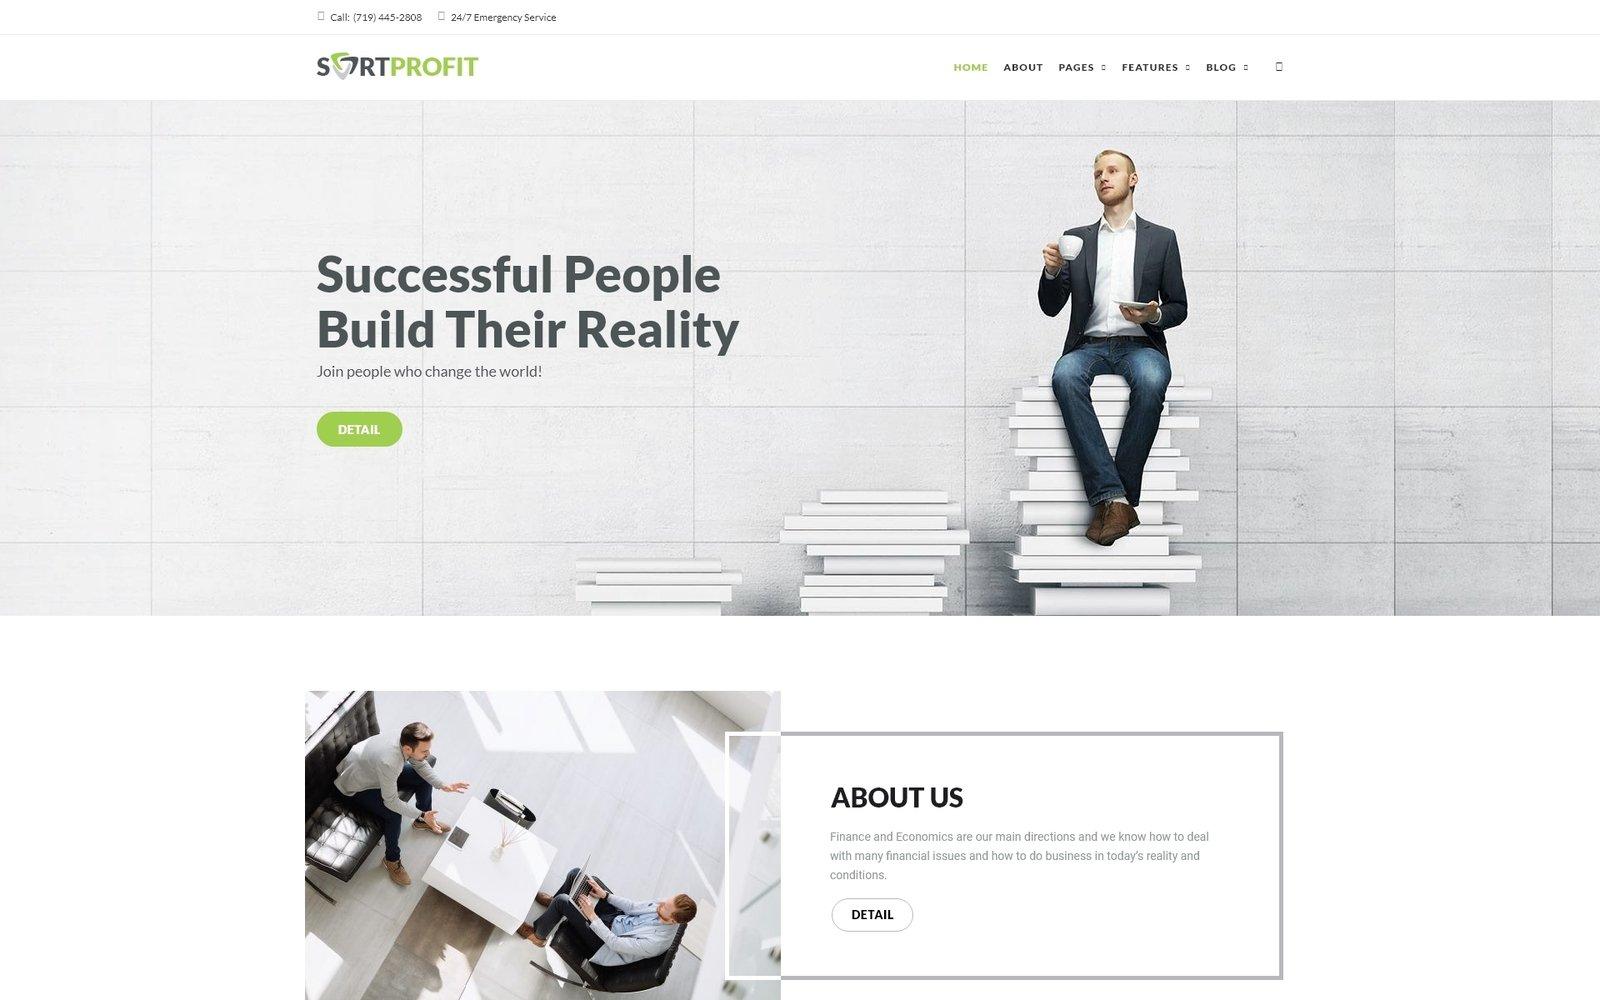 Responsivt SortProfit - Business & Finance WordPress Theme WordPress-tema #65113 - skärmbild